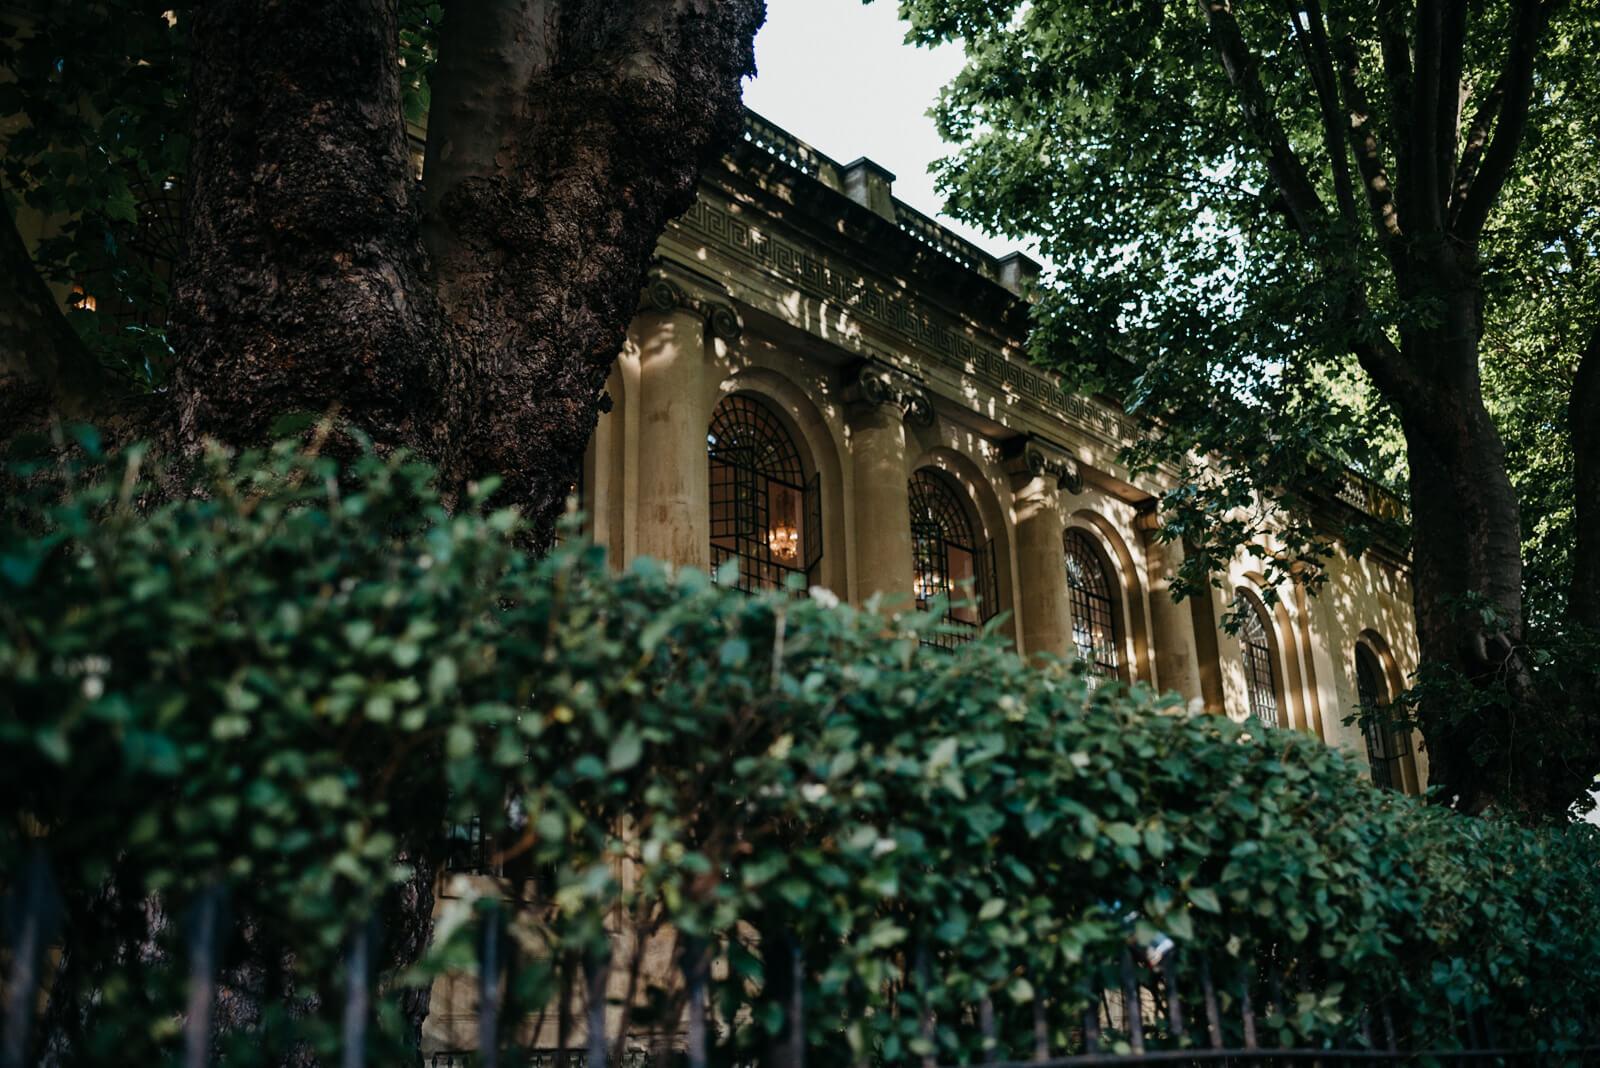 The decadent and stylish exterior of Marylebone One, London